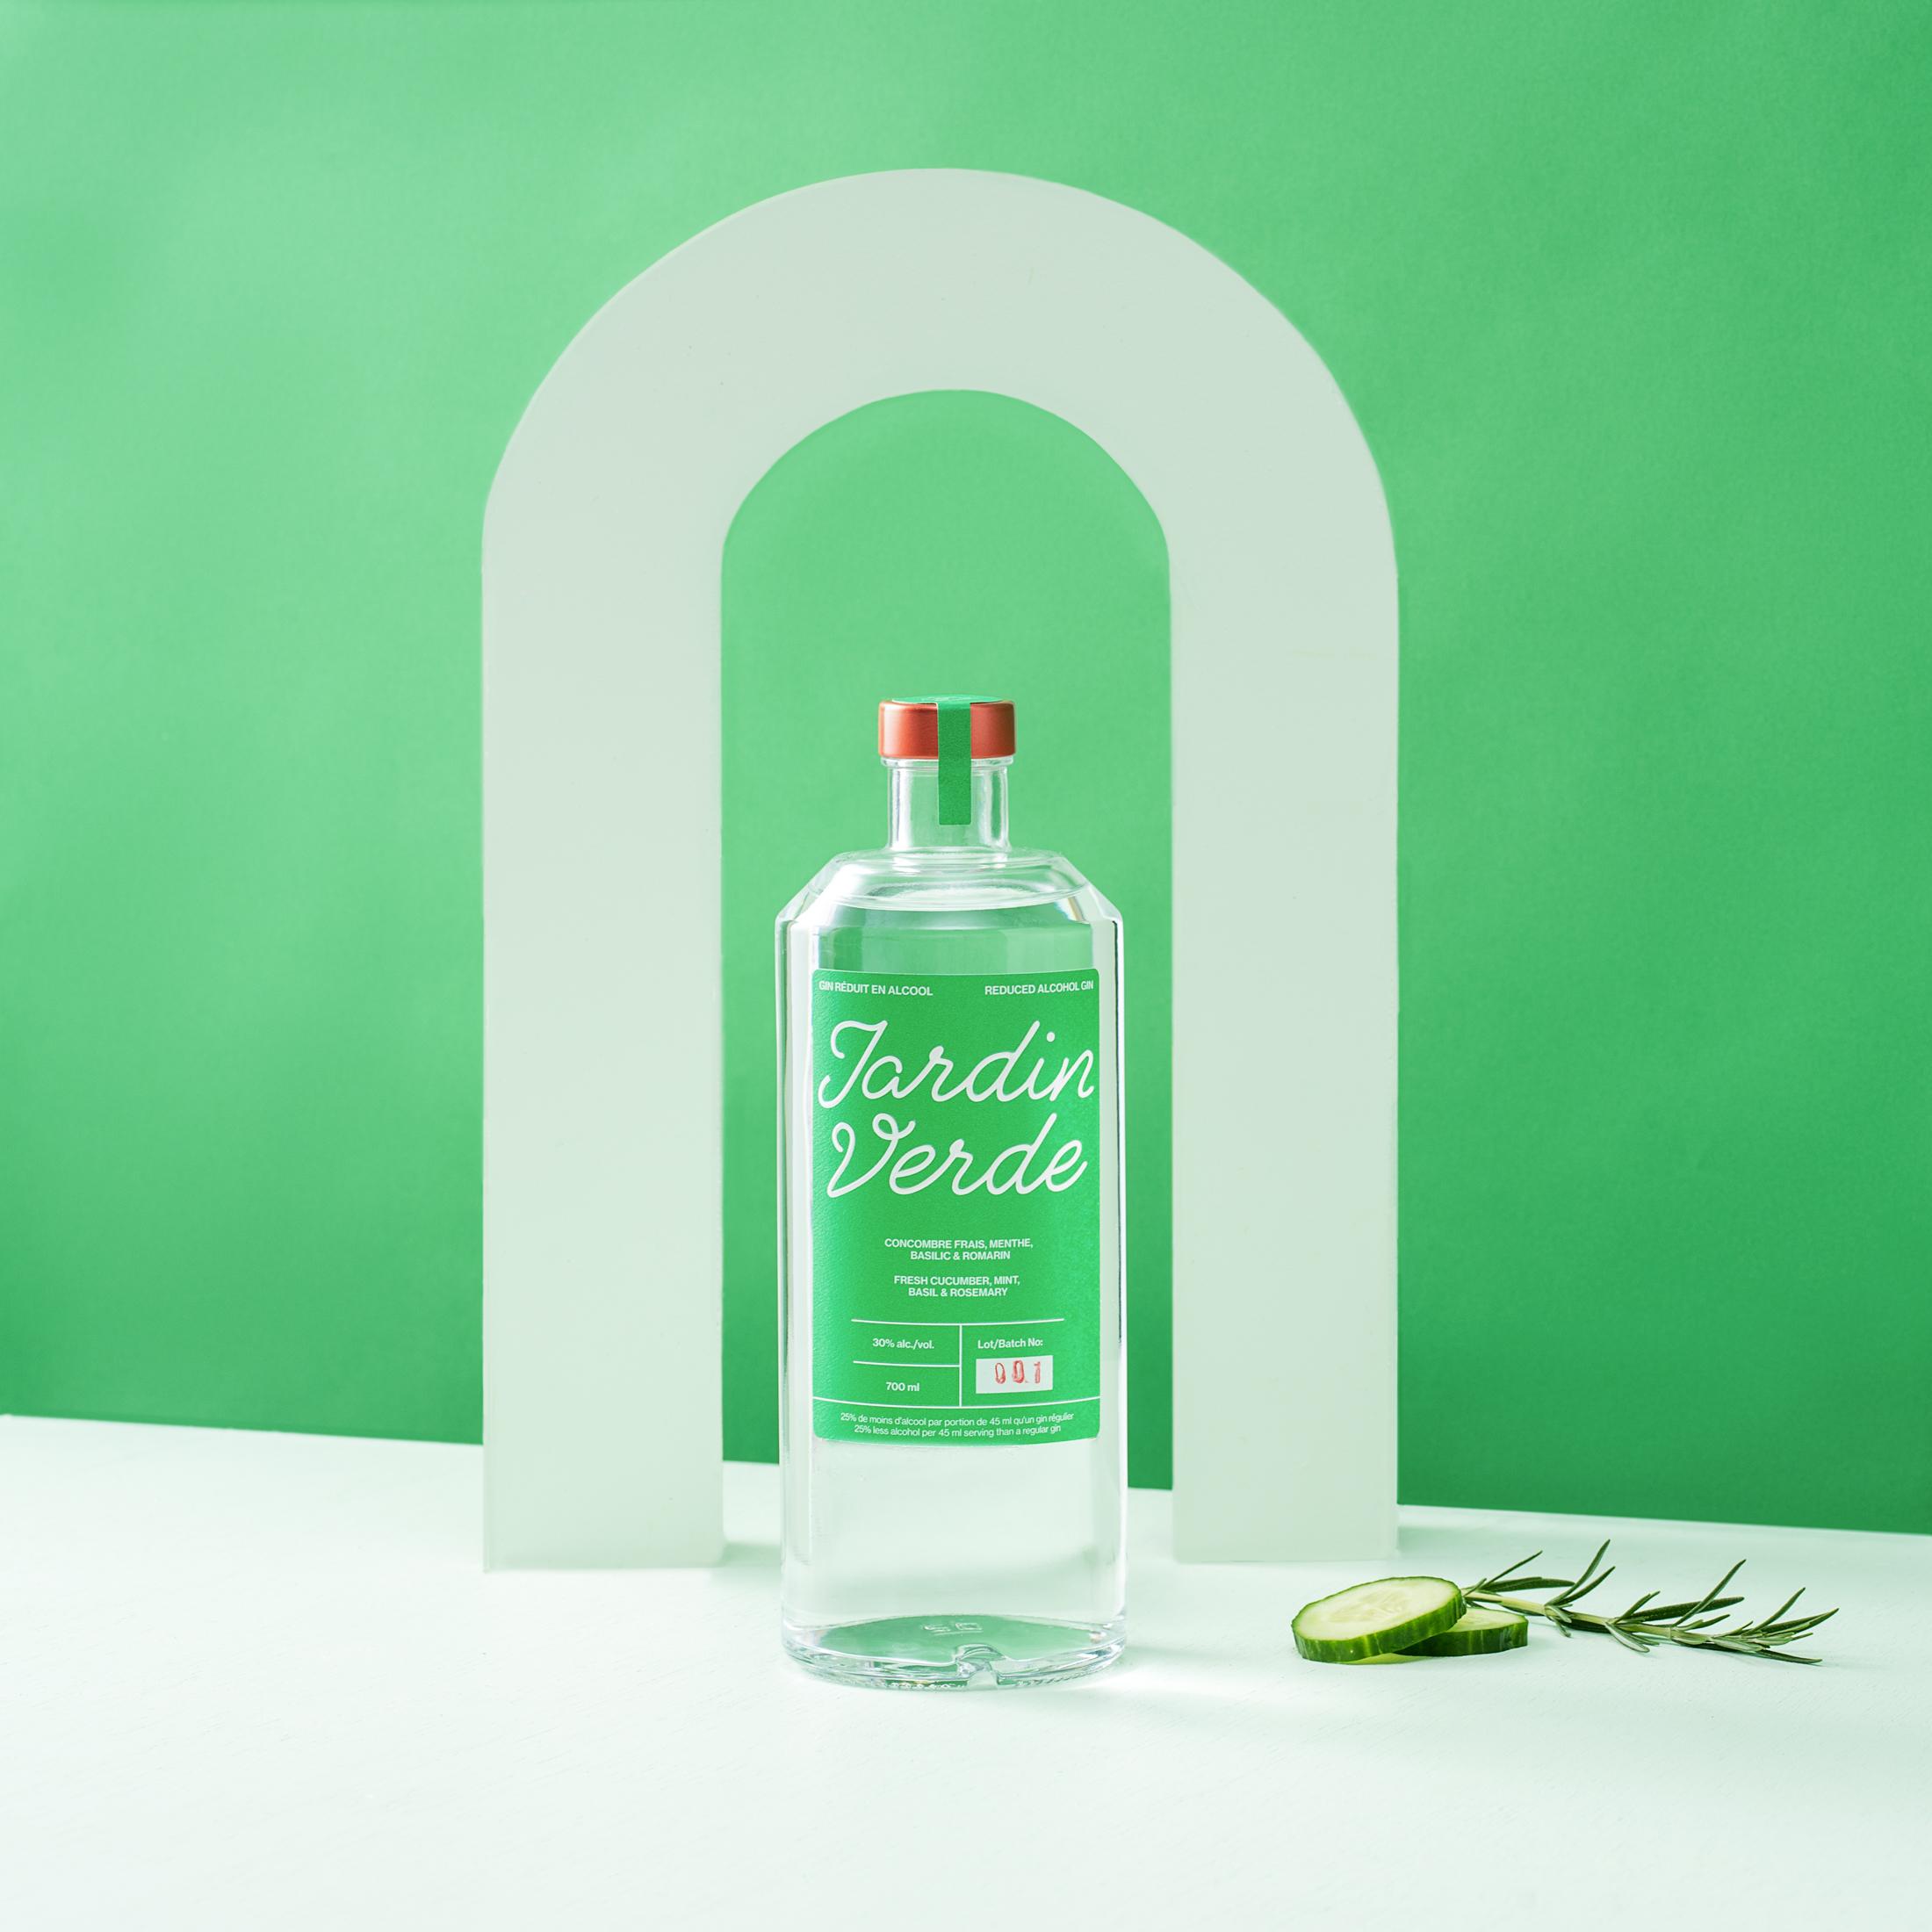 Jardin, verde, gin, distillerie, blue, pearl, distillery, québécois, local, alcool